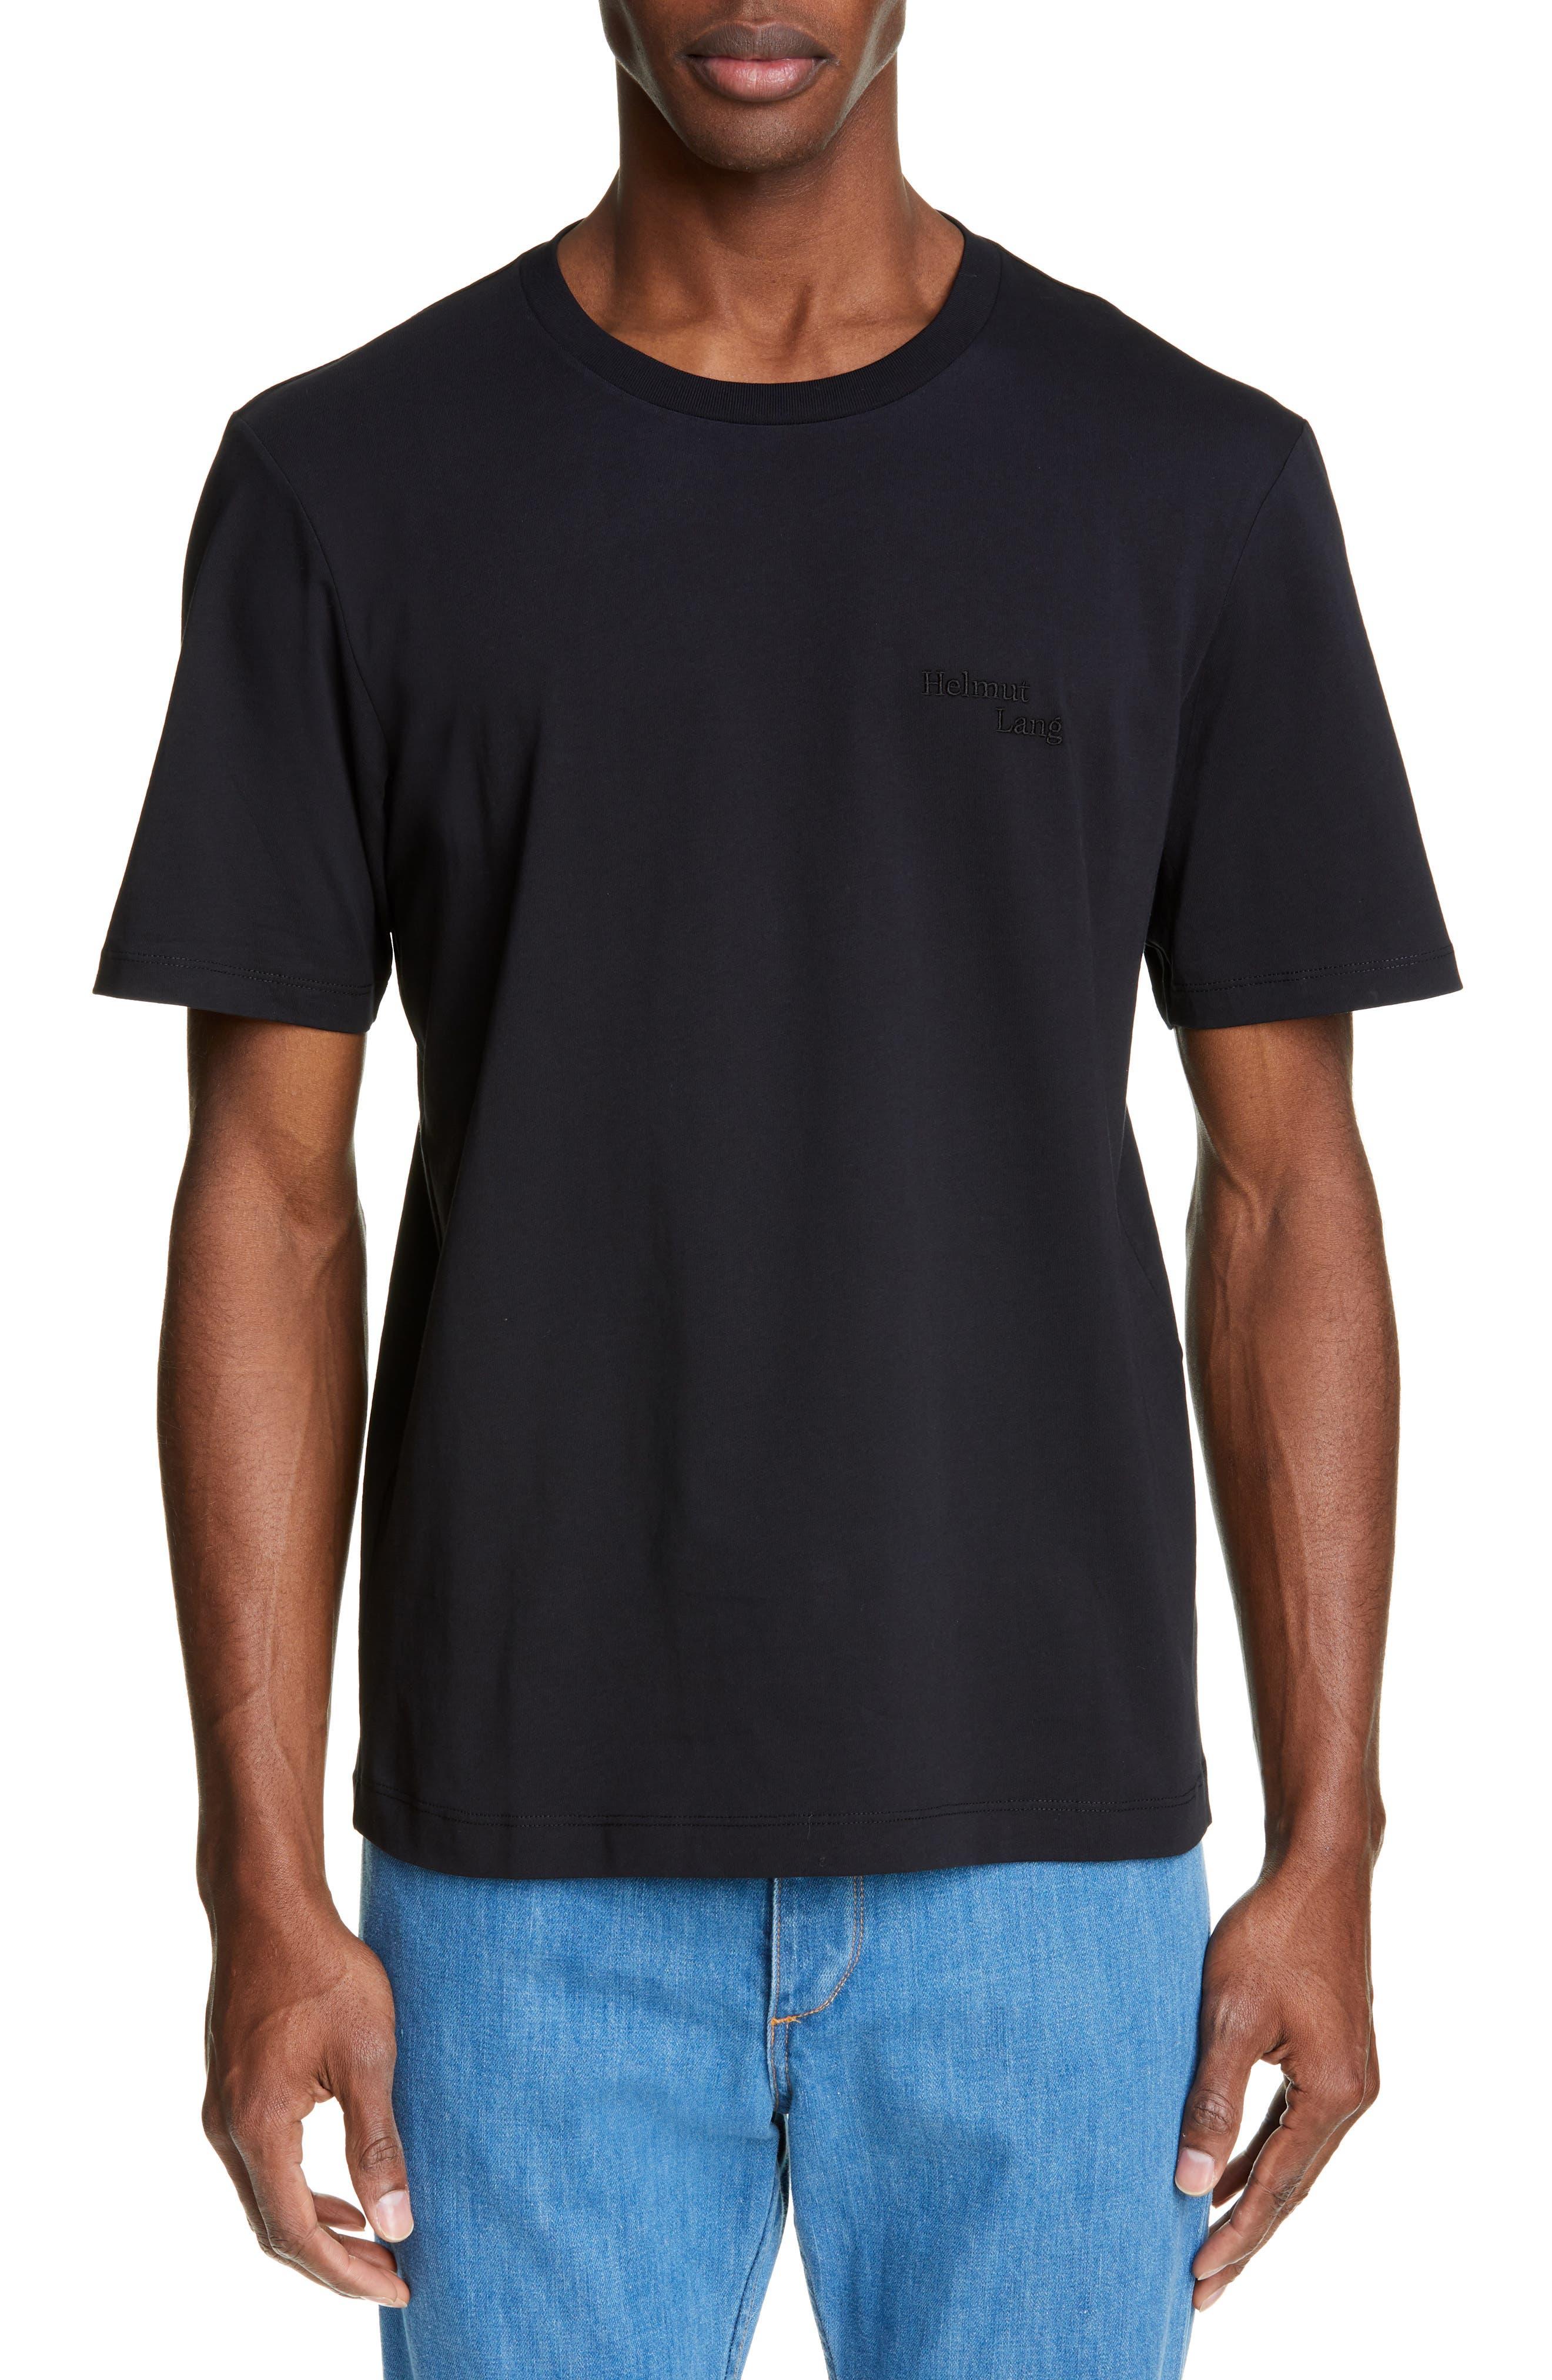 HELMUT LANG, Stacked Logo T-Shirt, Main thumbnail 1, color, BLACK BASALT